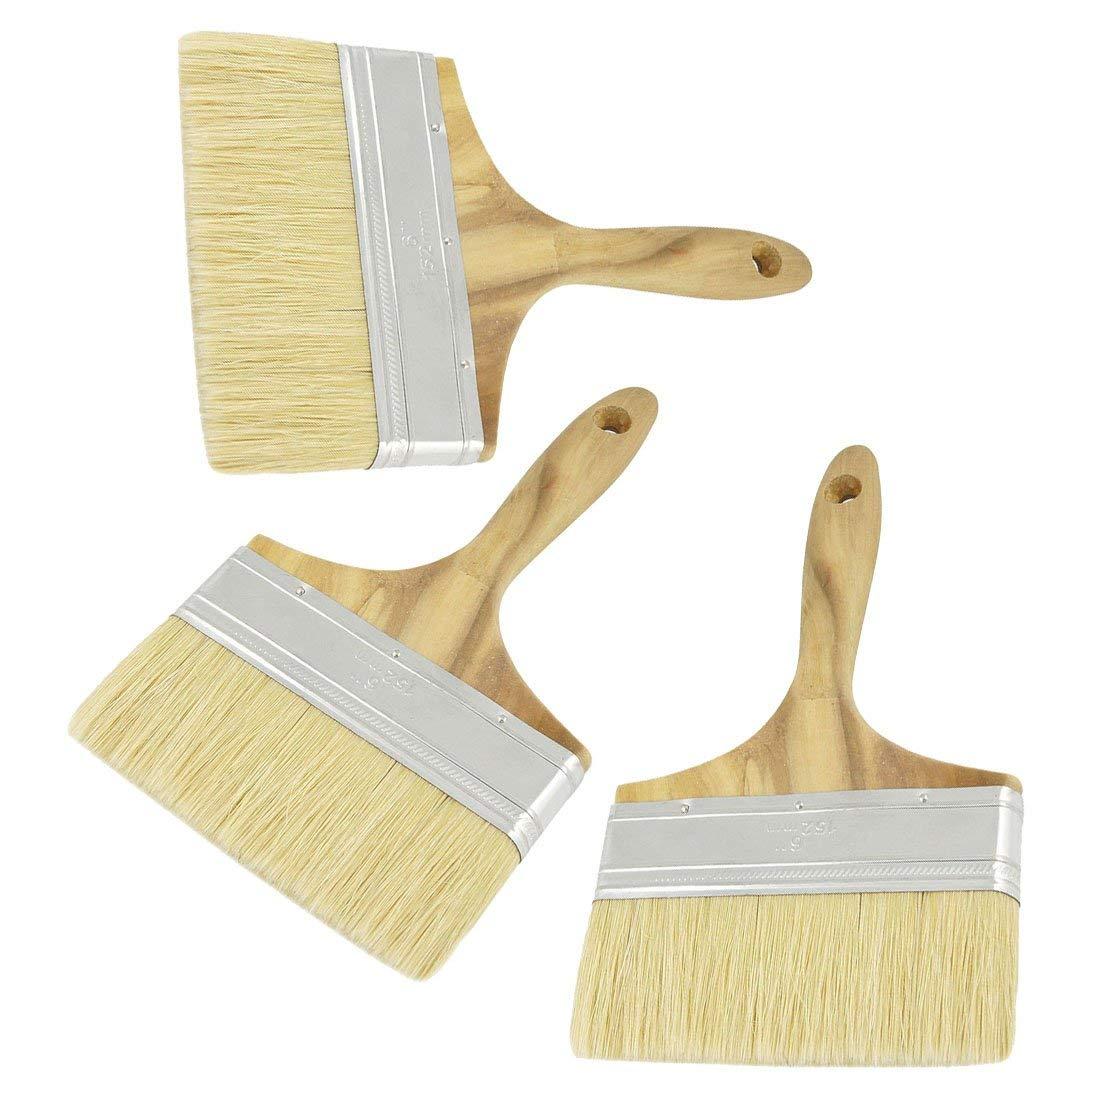 "Axiwen 5"" Wide Bristle Hair Wooden Handle Paint Brush Wall Painting Tool"